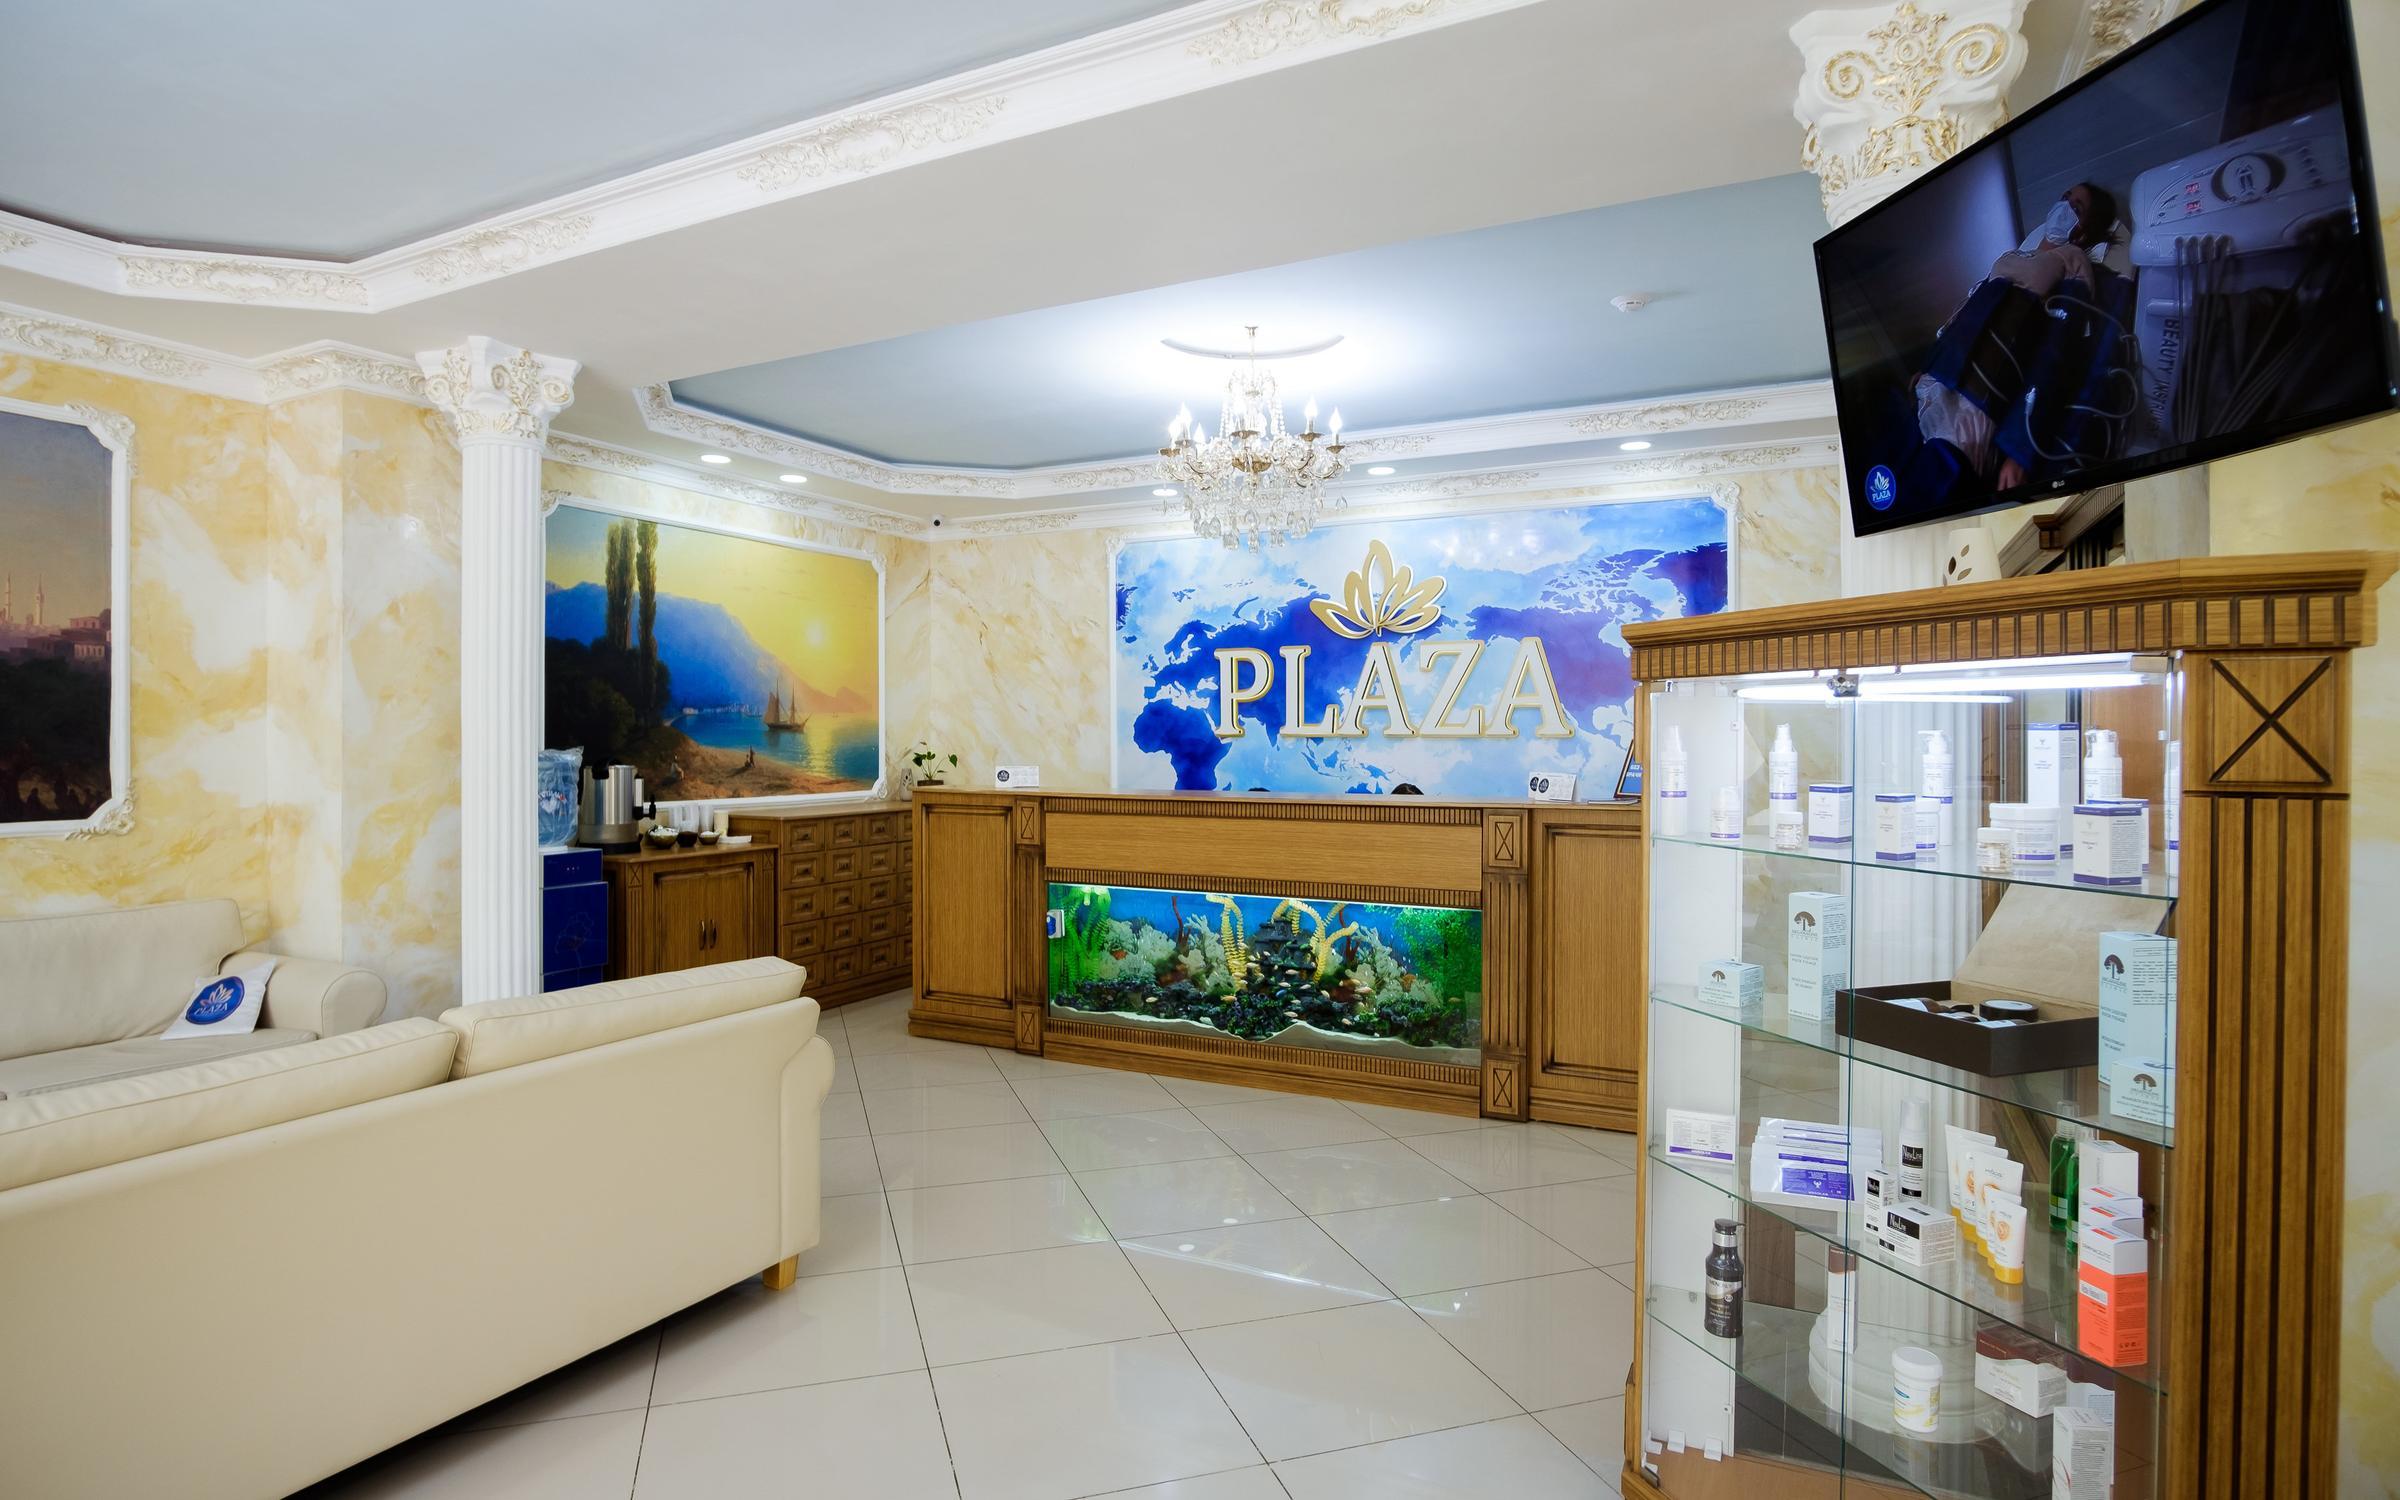 фотография Медицинского центра Plaza на проспекте Нуркена Абдирова